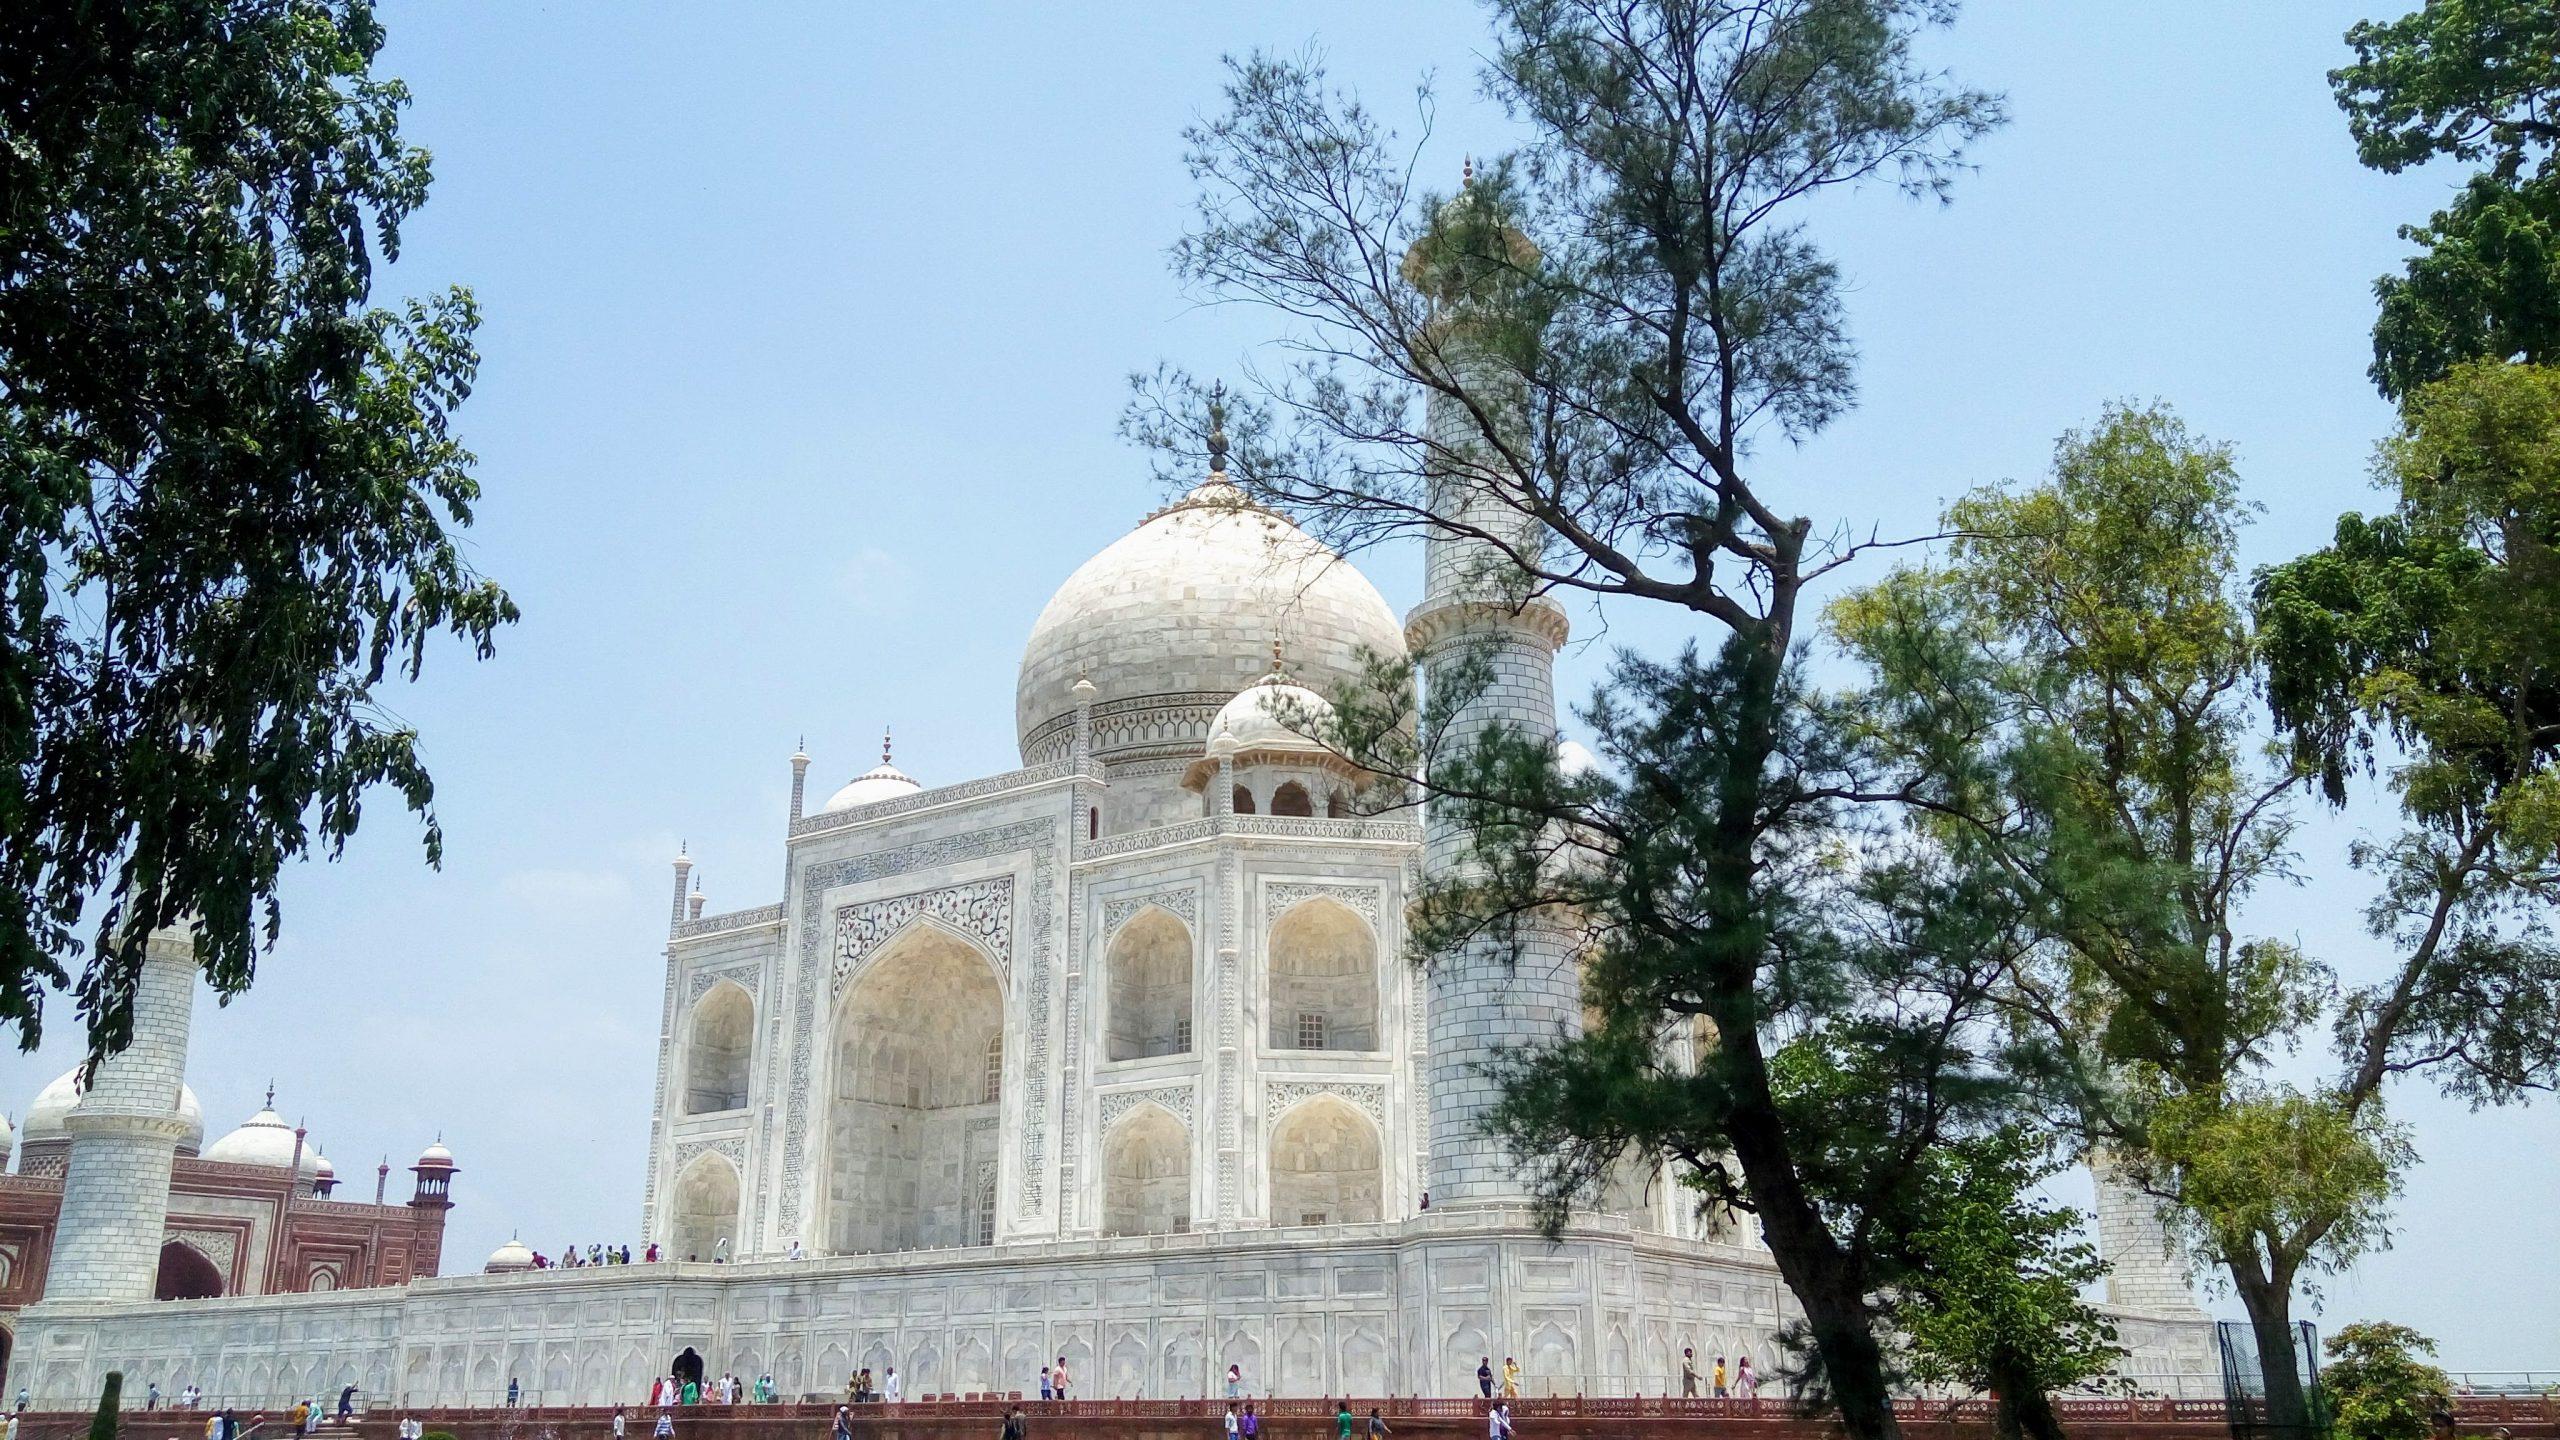 A side view of Taj Mahal